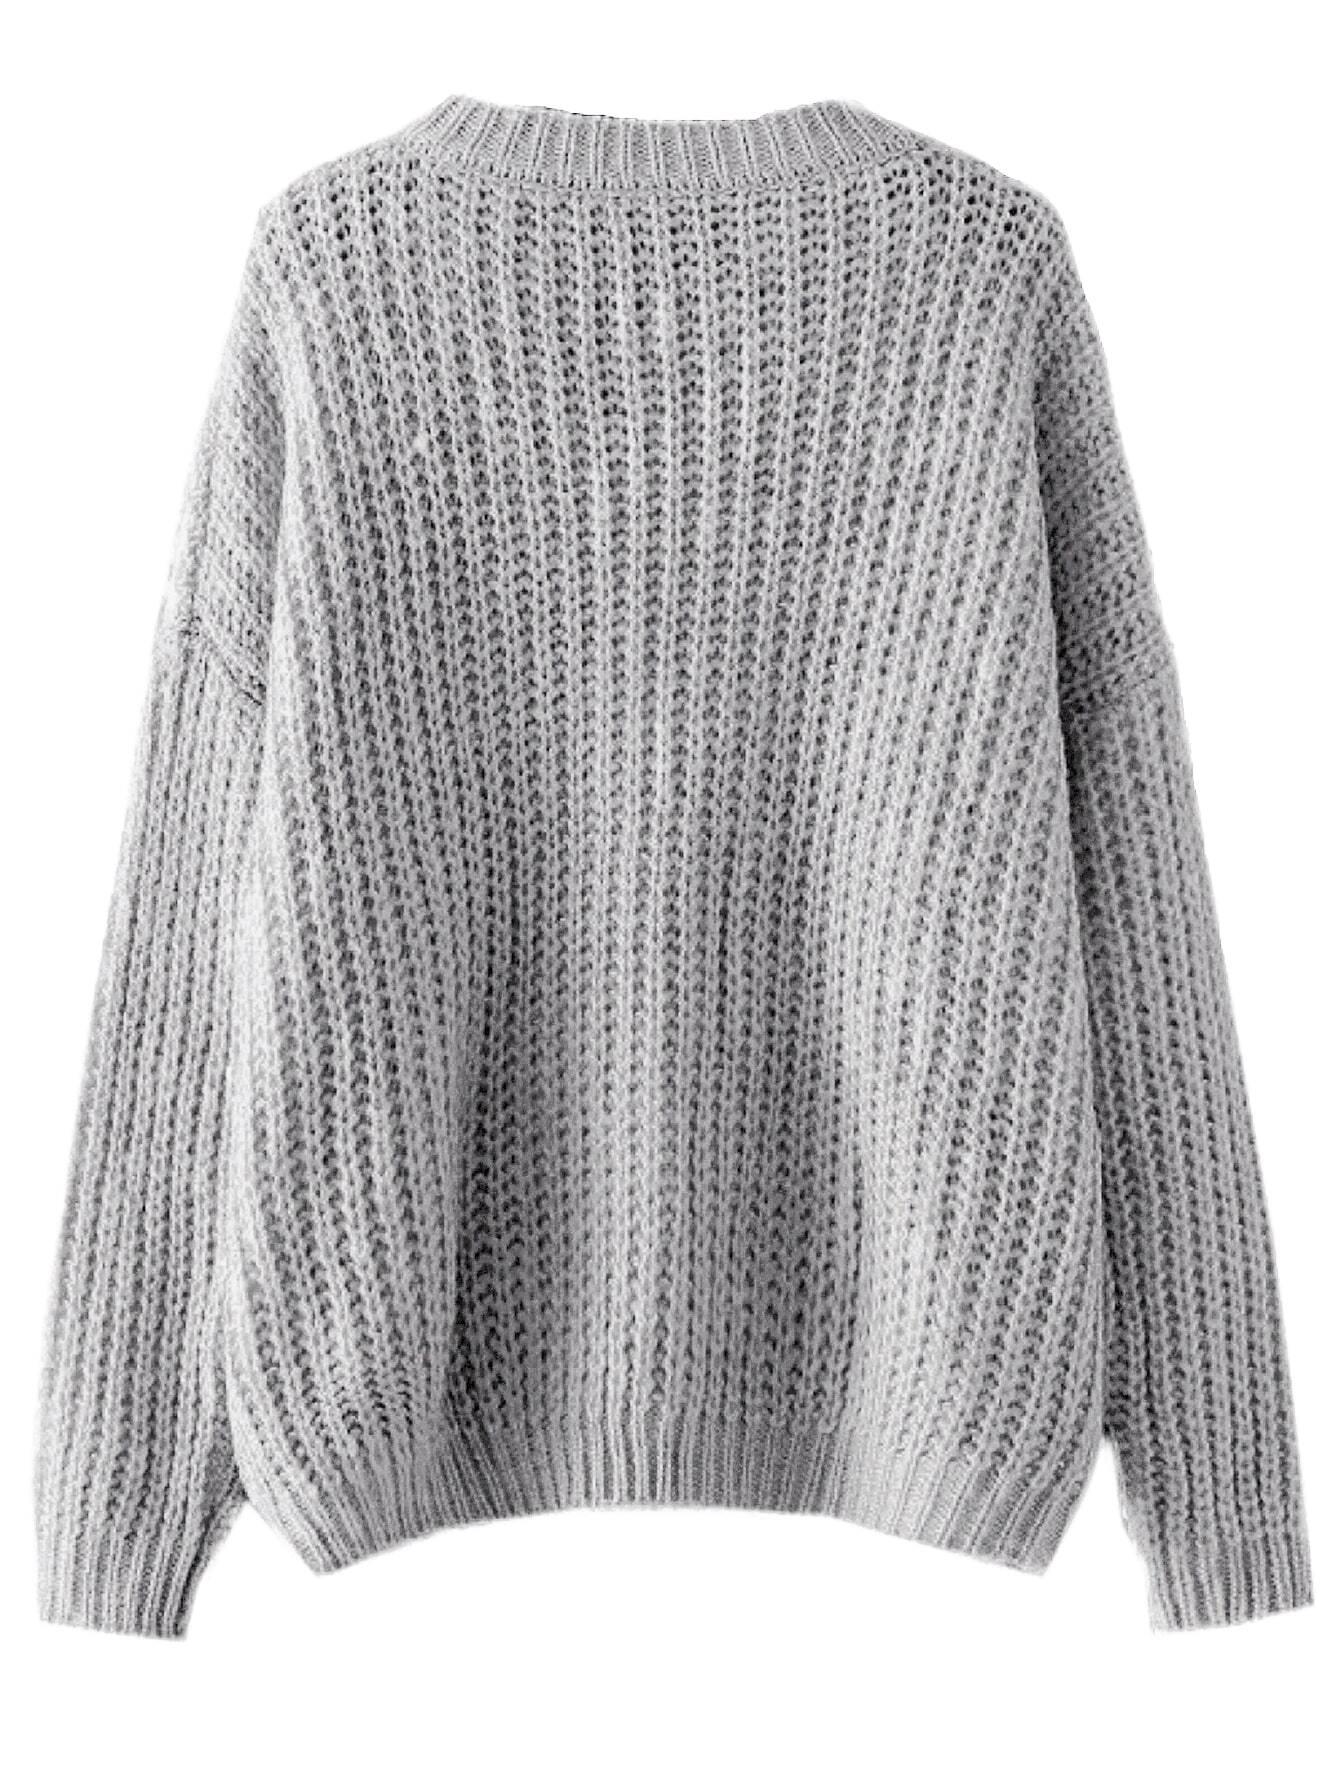 sweater161117404_2